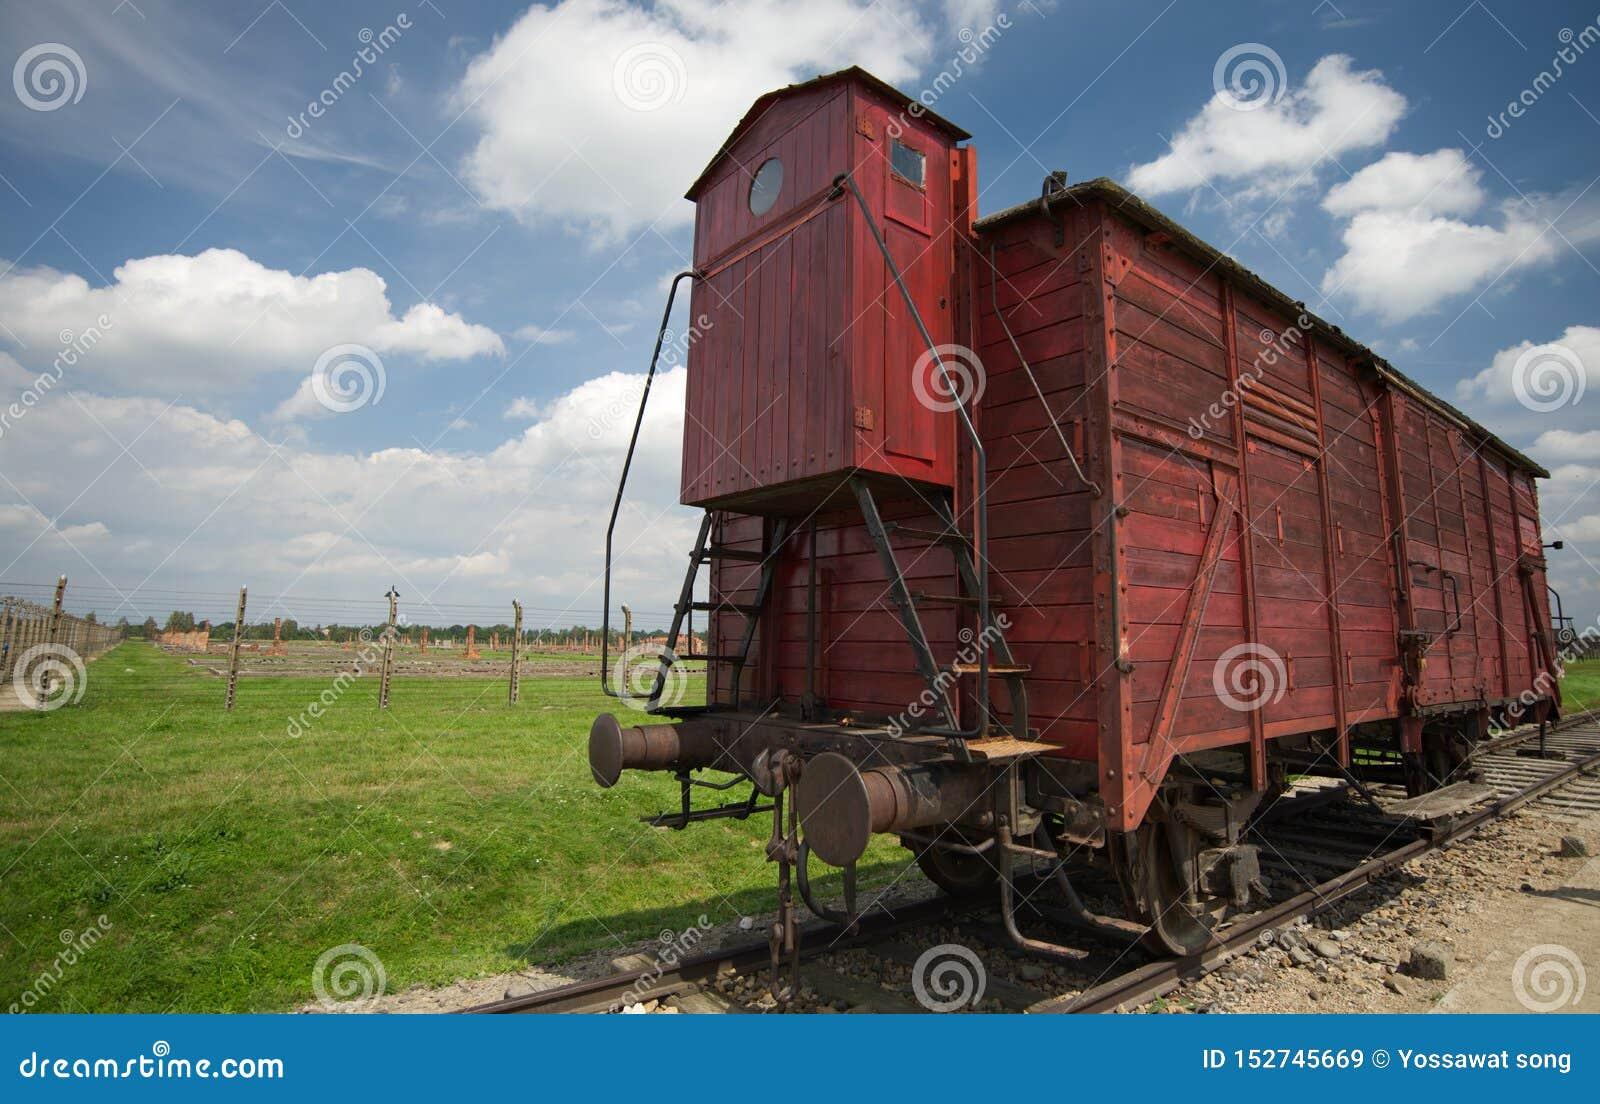 Freight car in Auschwitz II-Birkenau, Warsaw, Poland